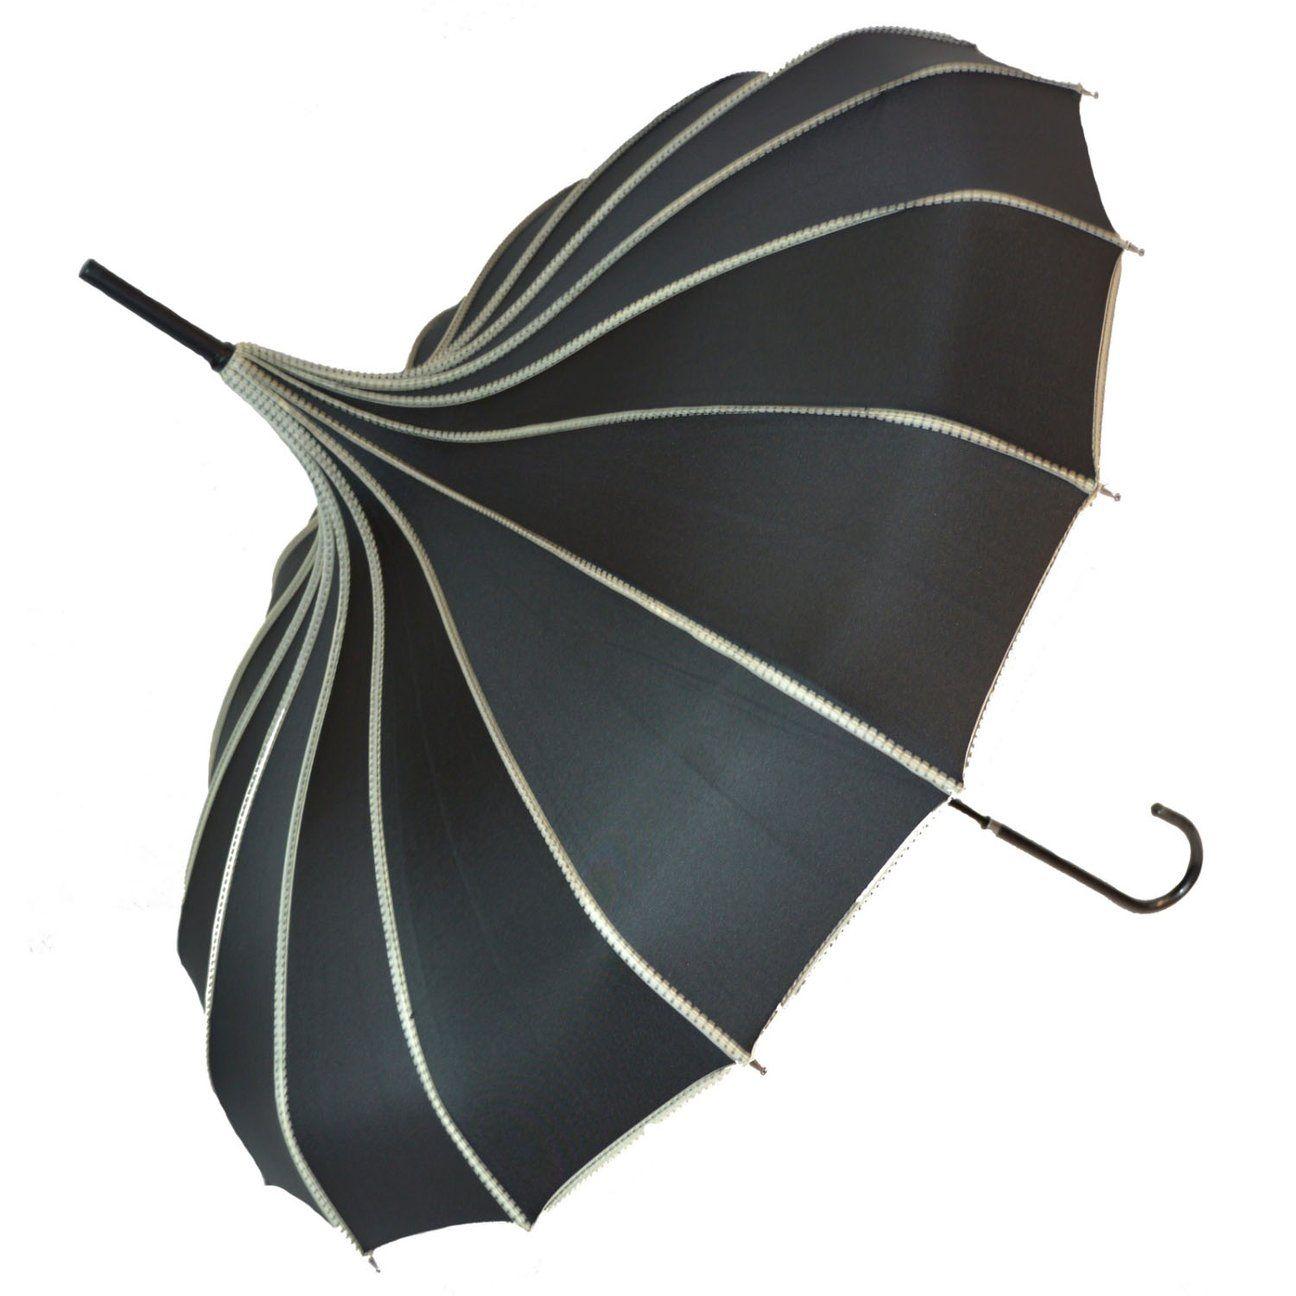 black lace parasol steam punk victorian umbrella umberella